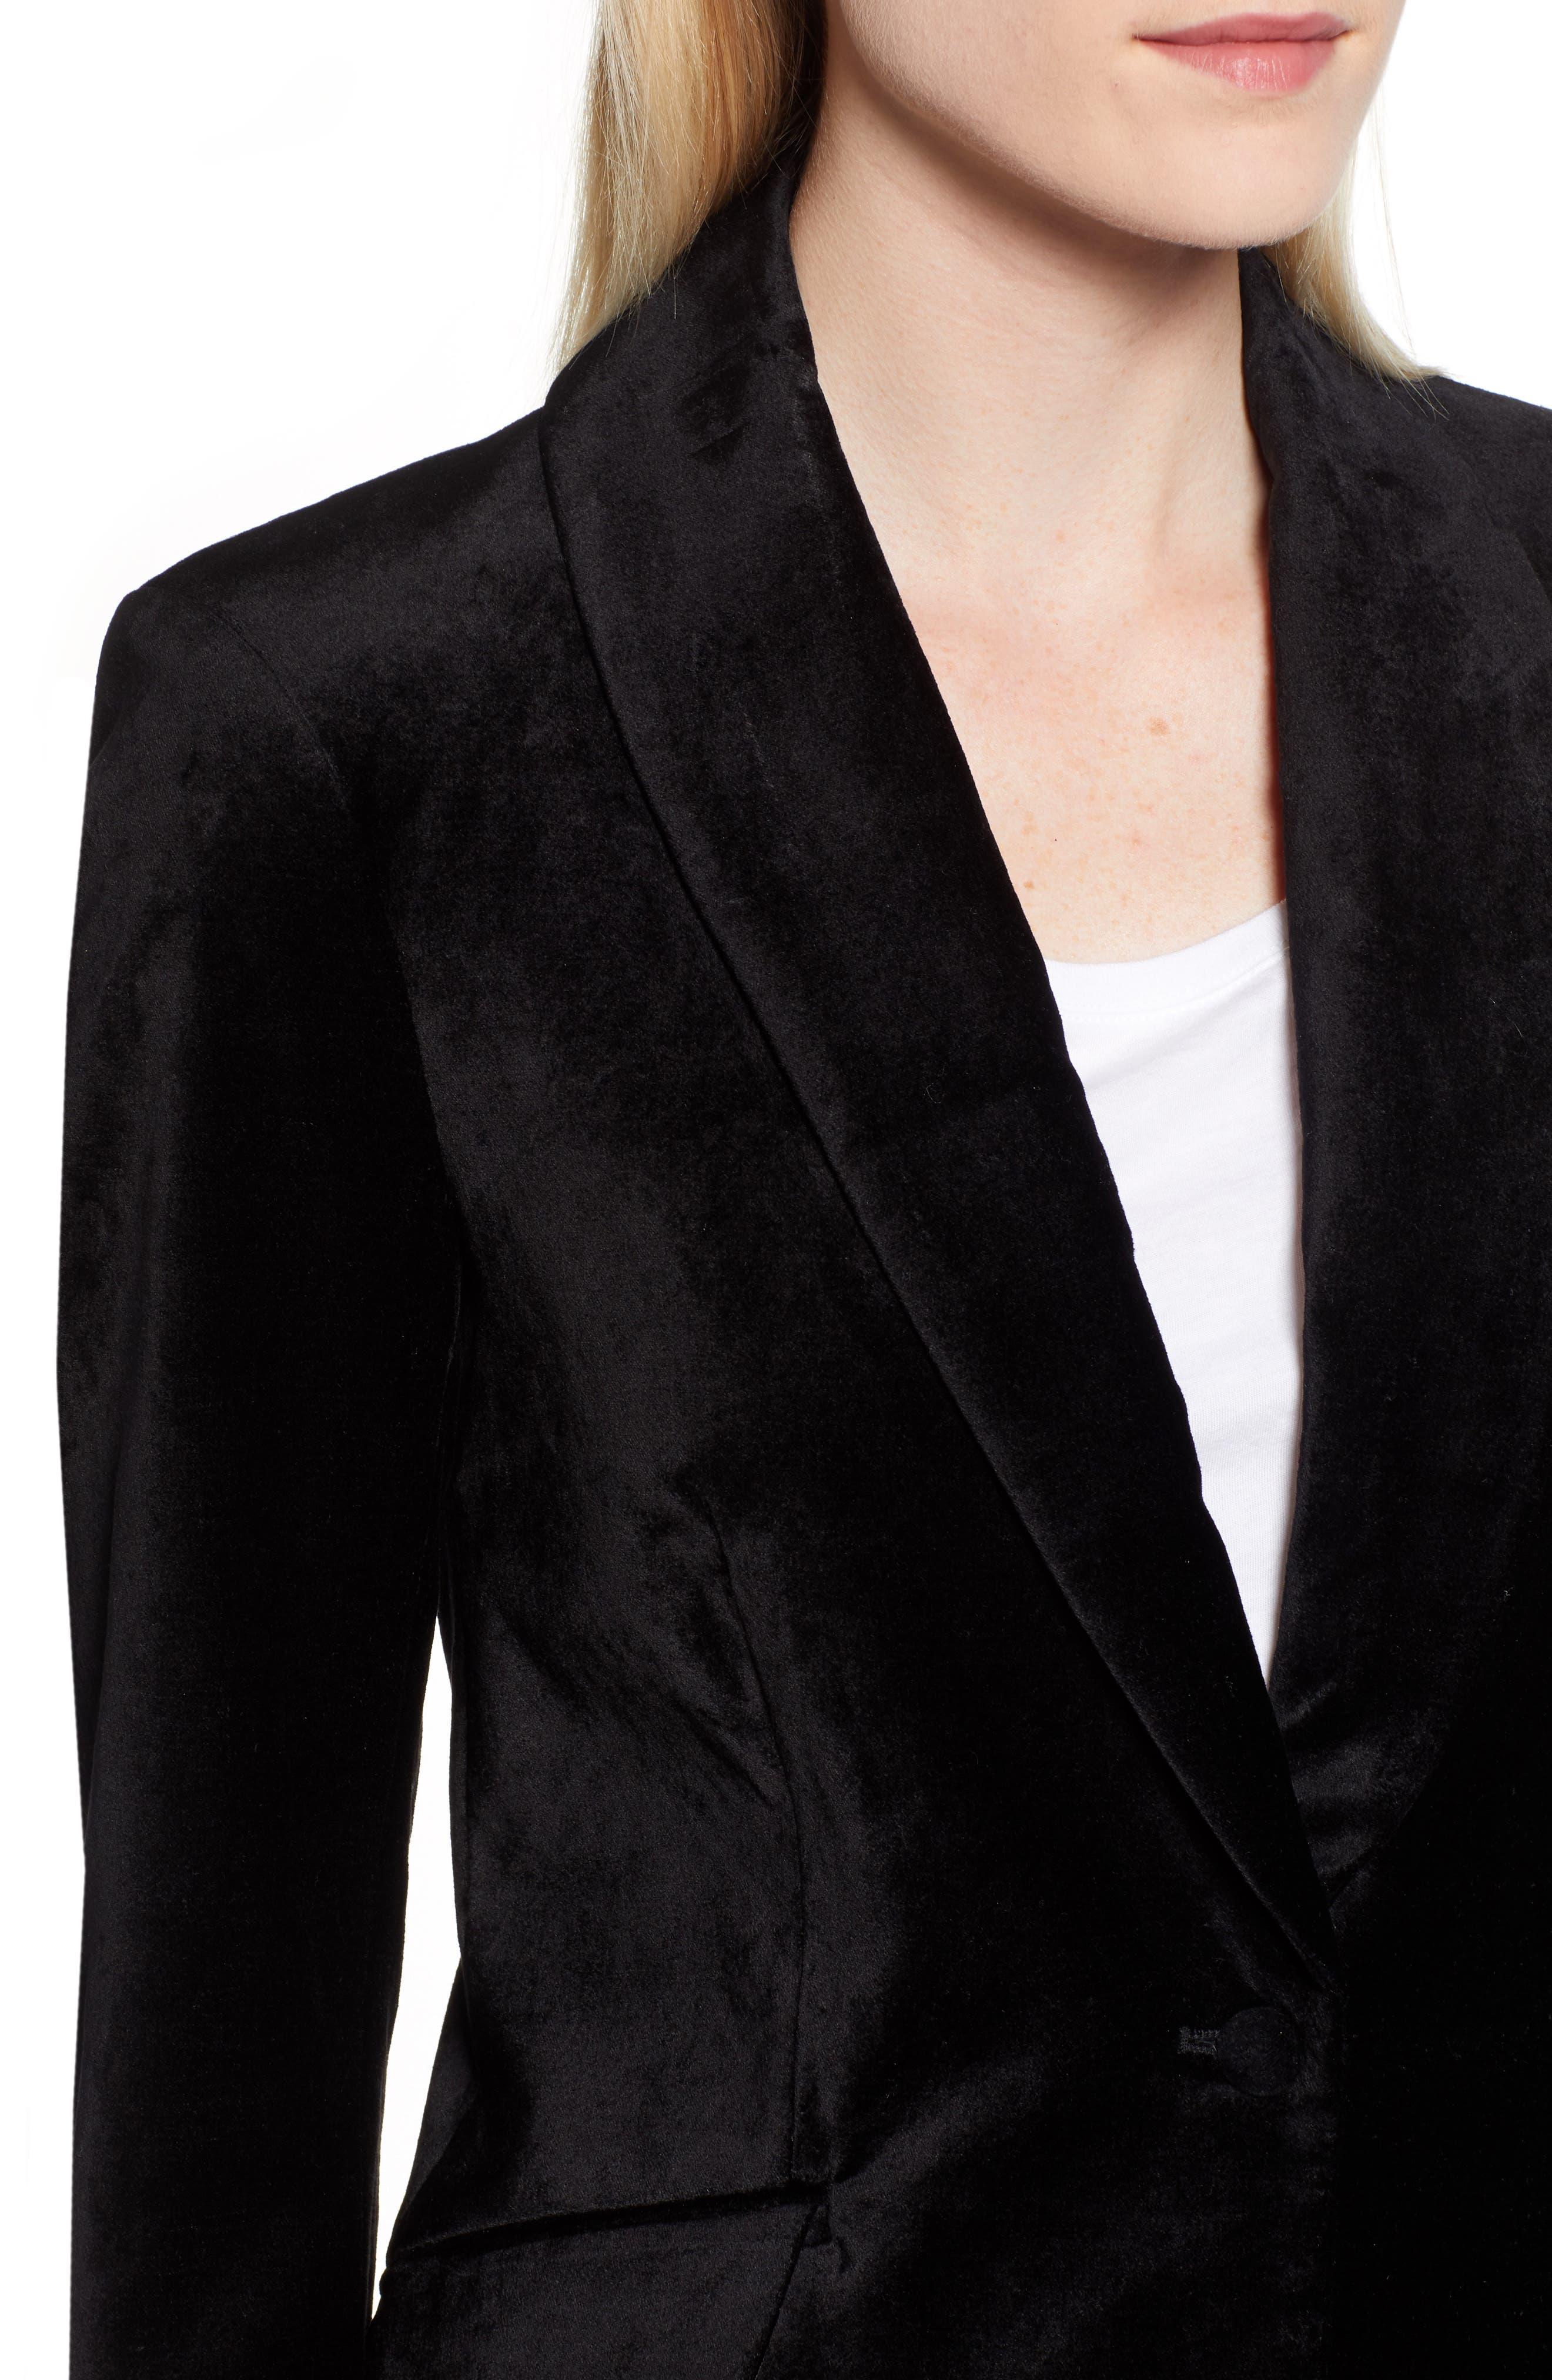 JEN7 BY 7 FOR ALL MANKIND, Stretch Cotton Velvet Blazer, Alternate thumbnail 5, color, BLACK